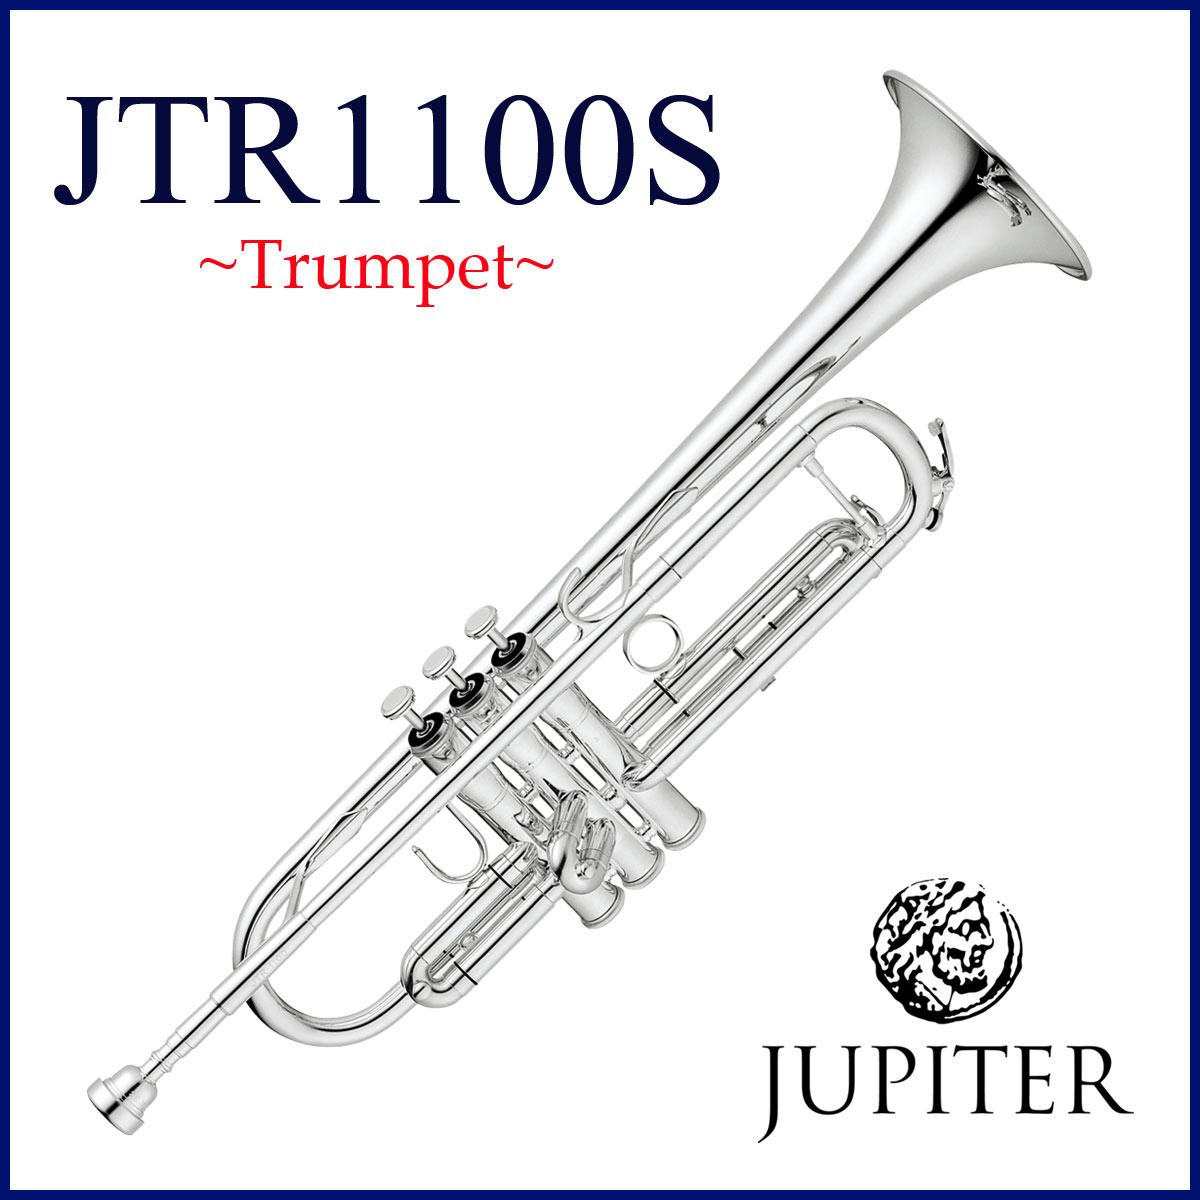 JUPITER / JTR-1100S ジュピター B♭ Trumpet トランペット プロシリーズ 銀メッキ仕上げ 《お取り寄せ》